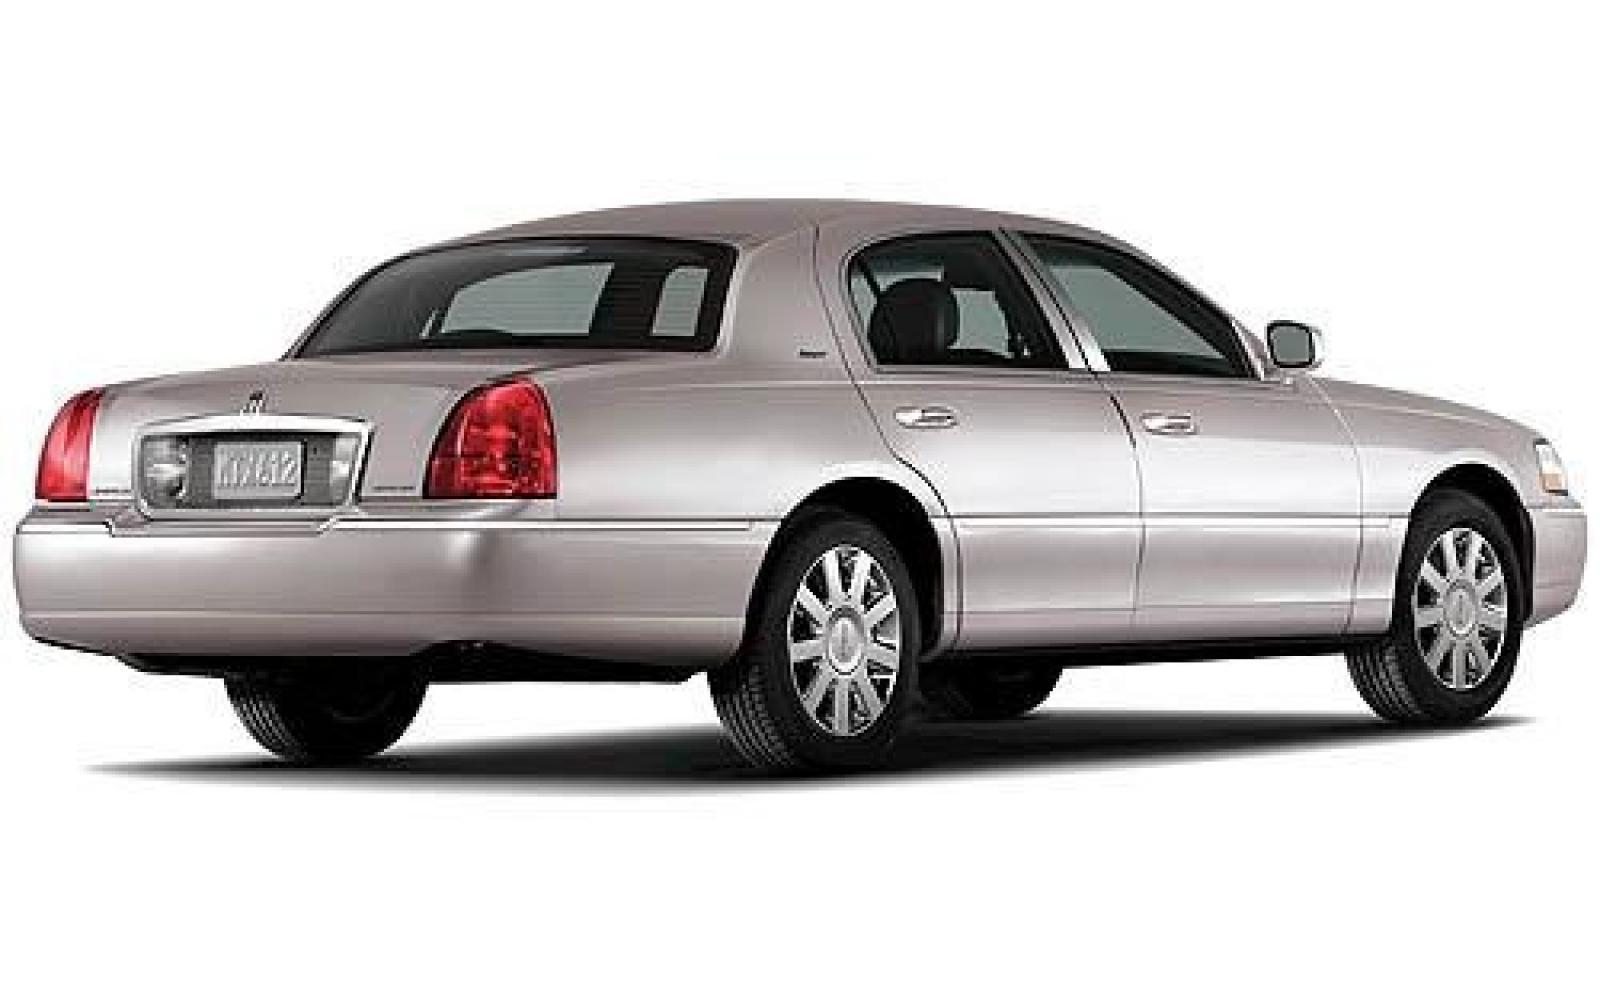 2009 Lincoln Town Car Sig Interior 2 800 1024 1280 1600 Origin